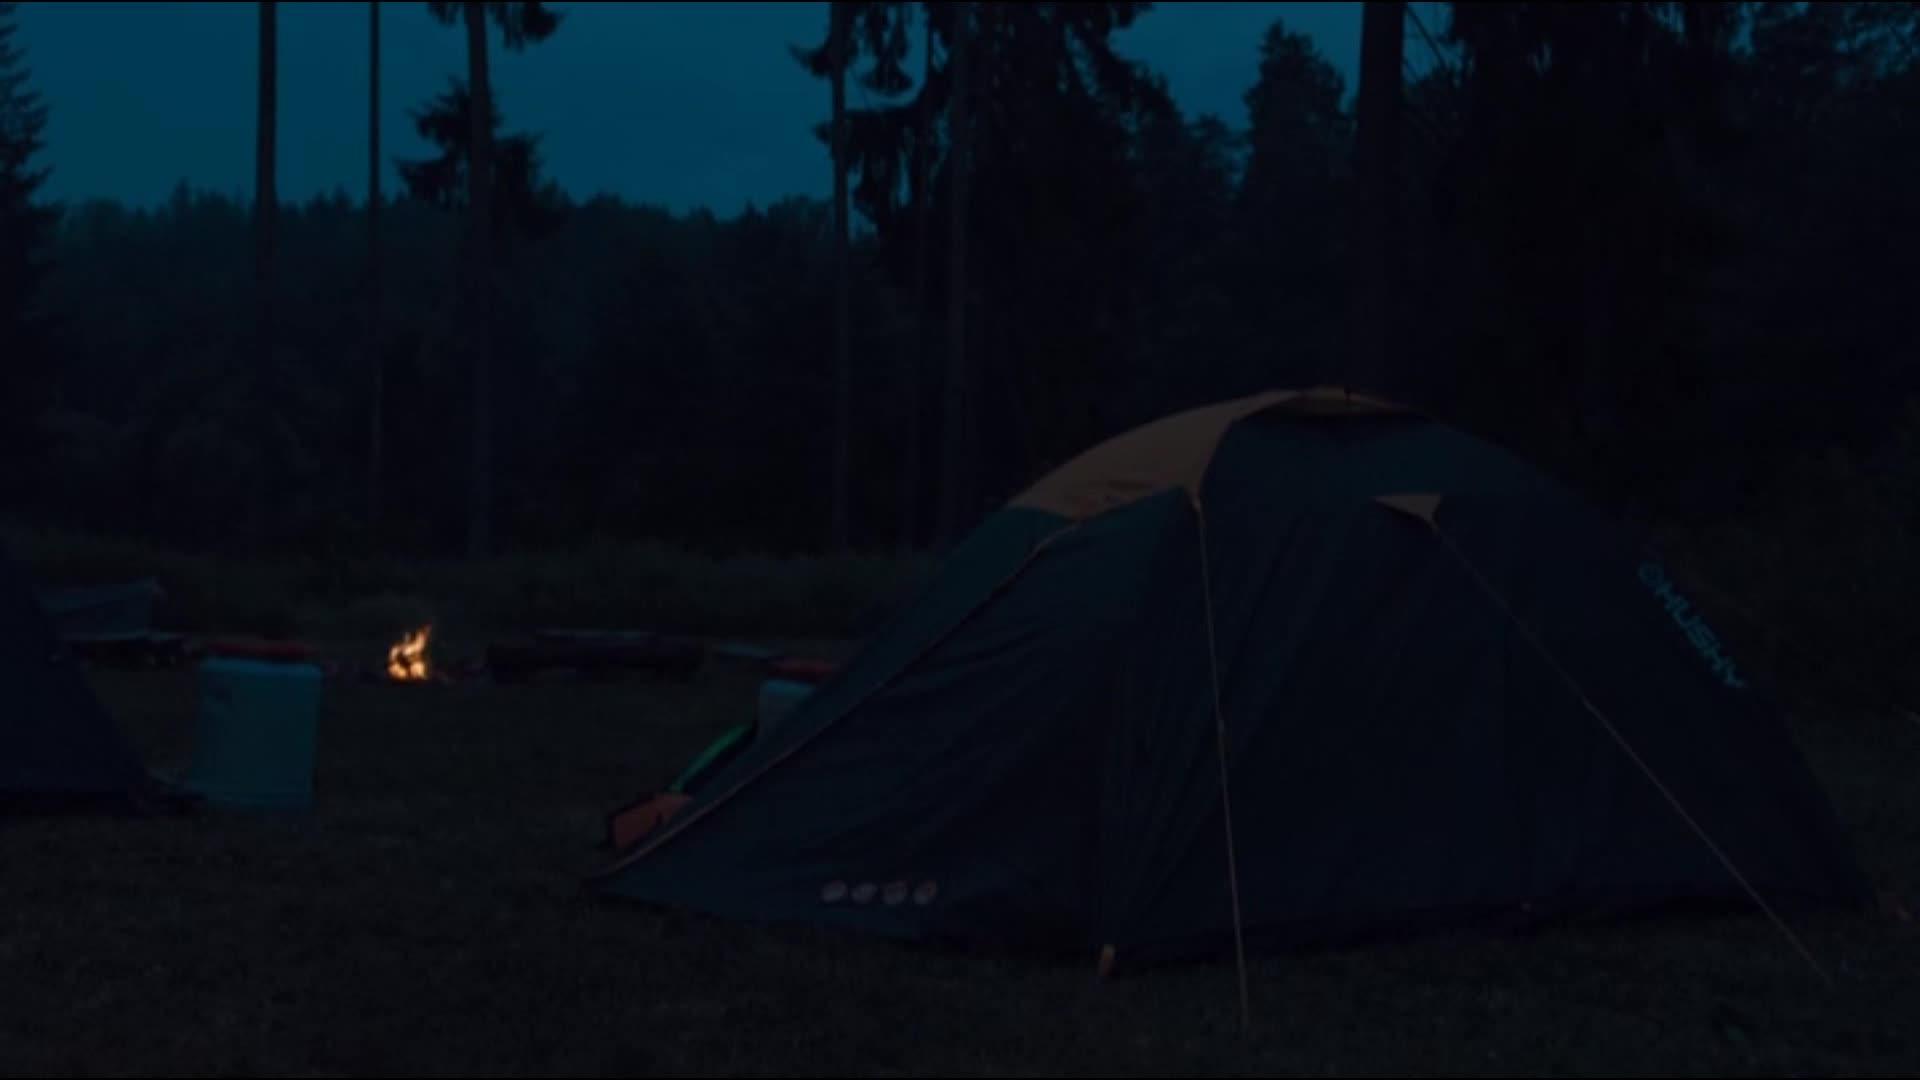 Spunti na vode 2017 CZ film